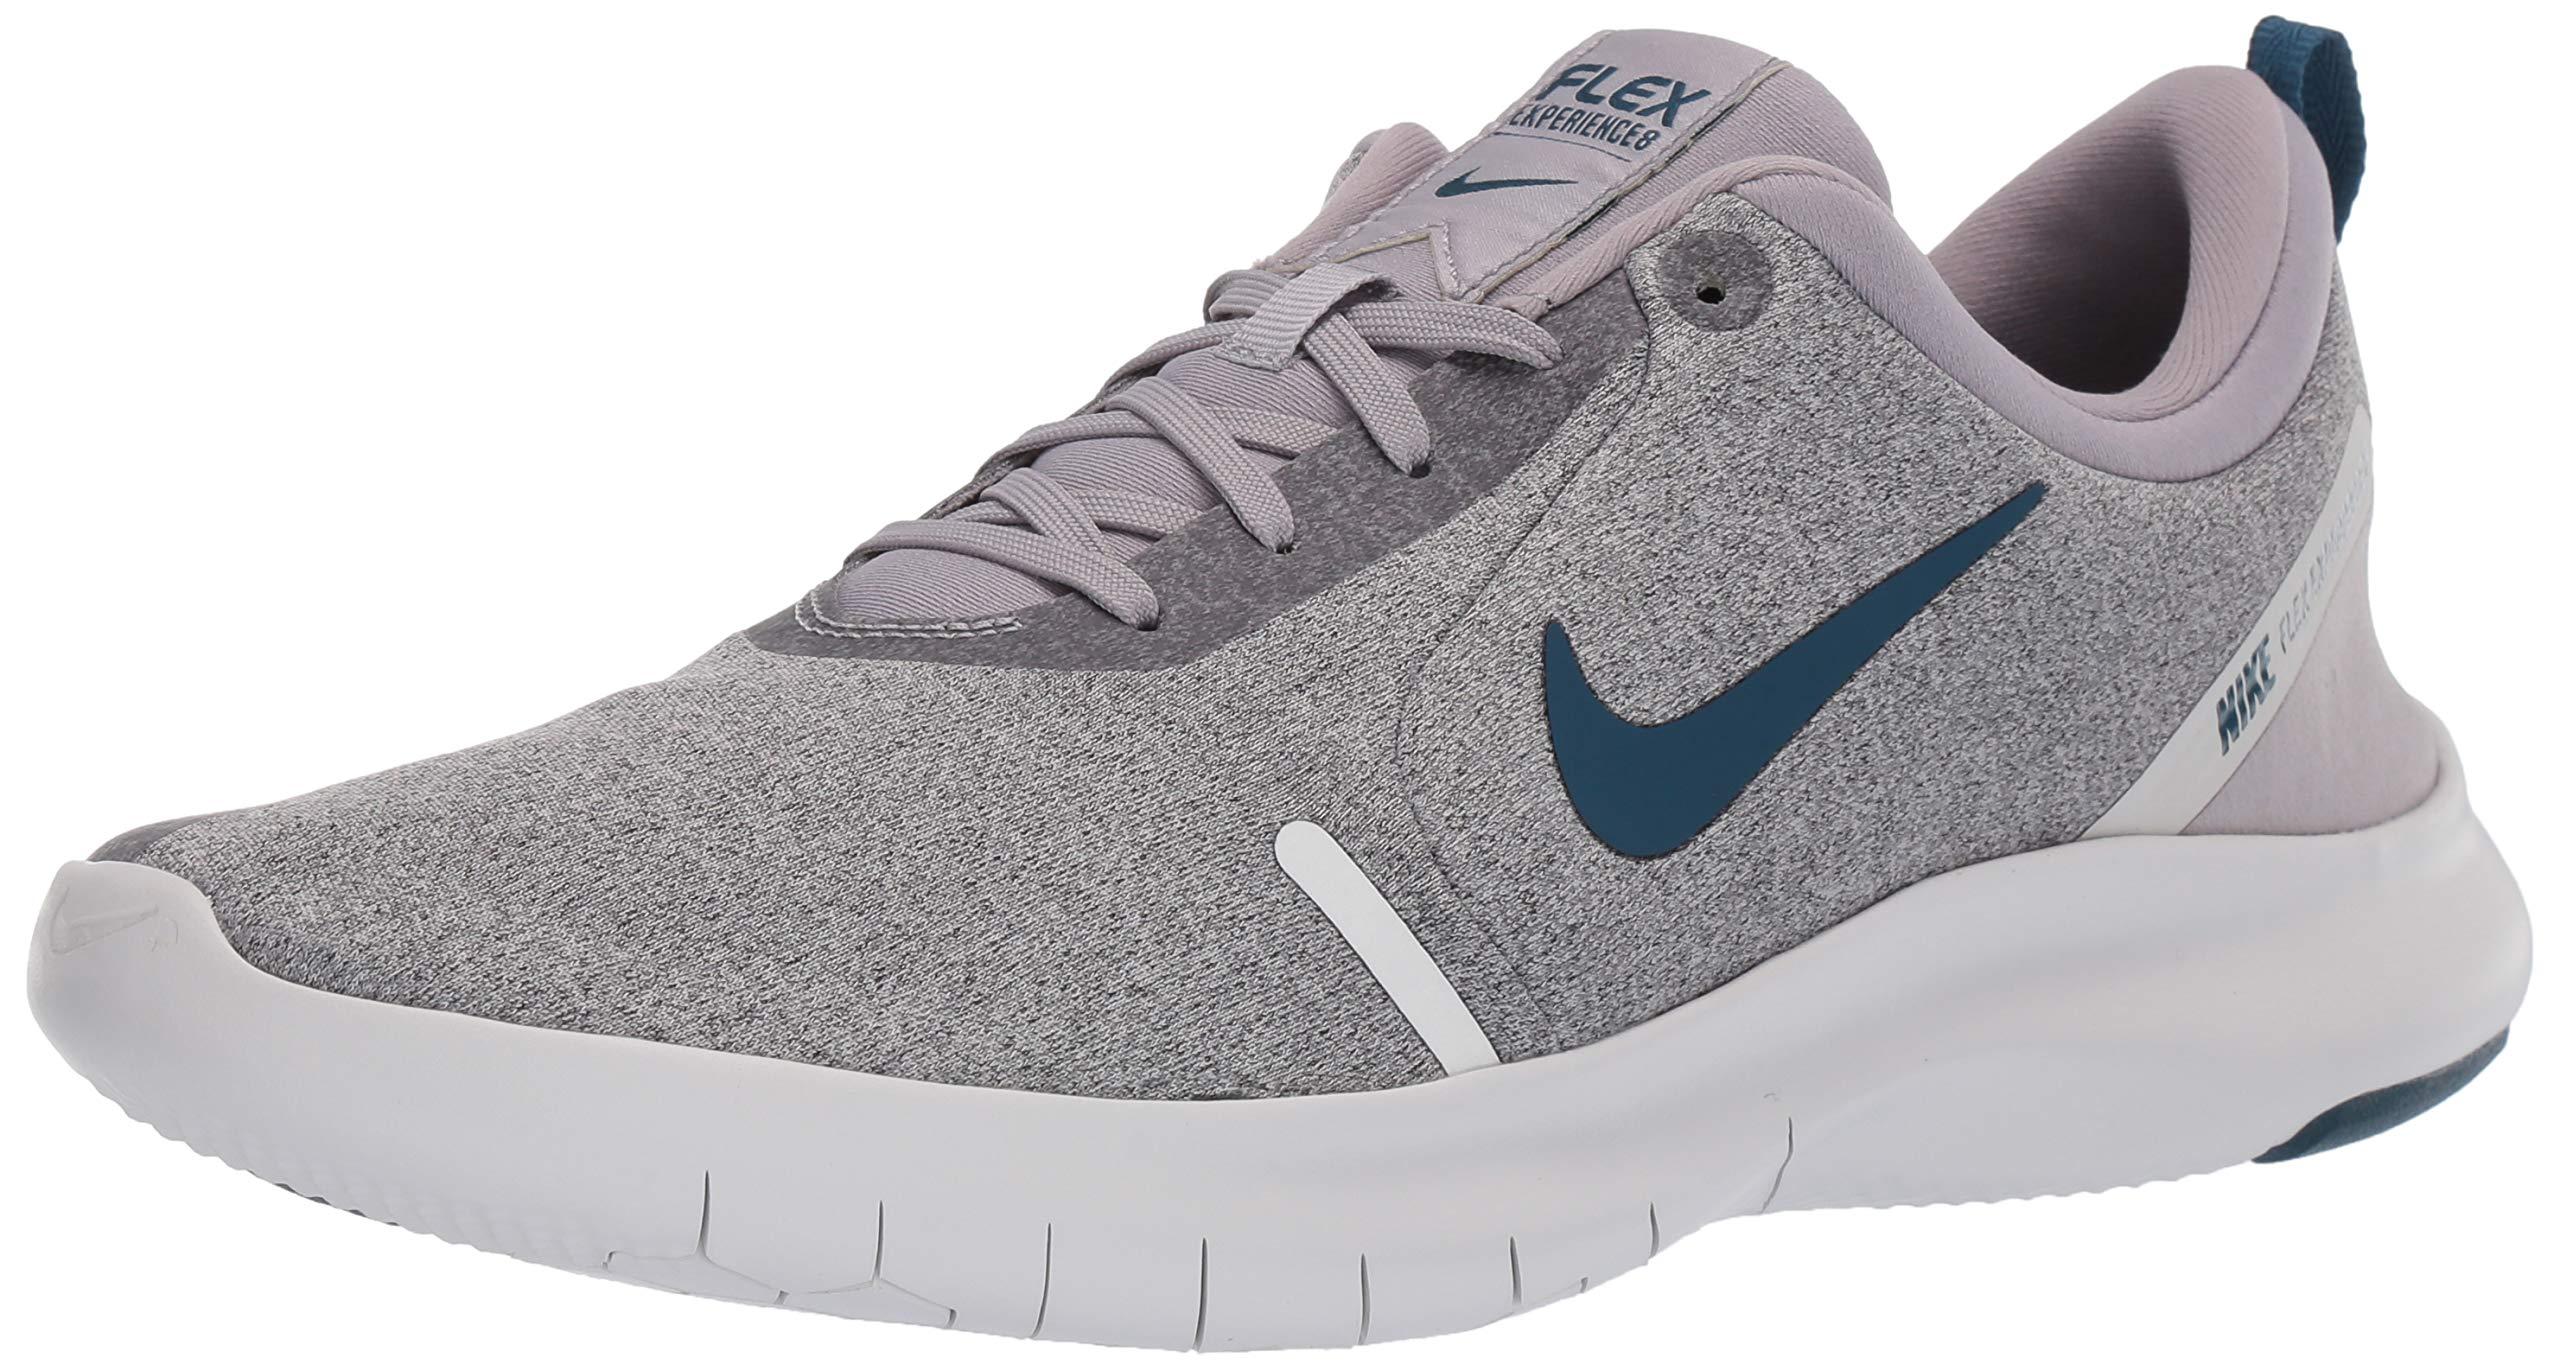 Nike Men's Flex Experience Run 8 Shoe, Atmosphere Grey/Blue Force-Off Noir, 7 4E US